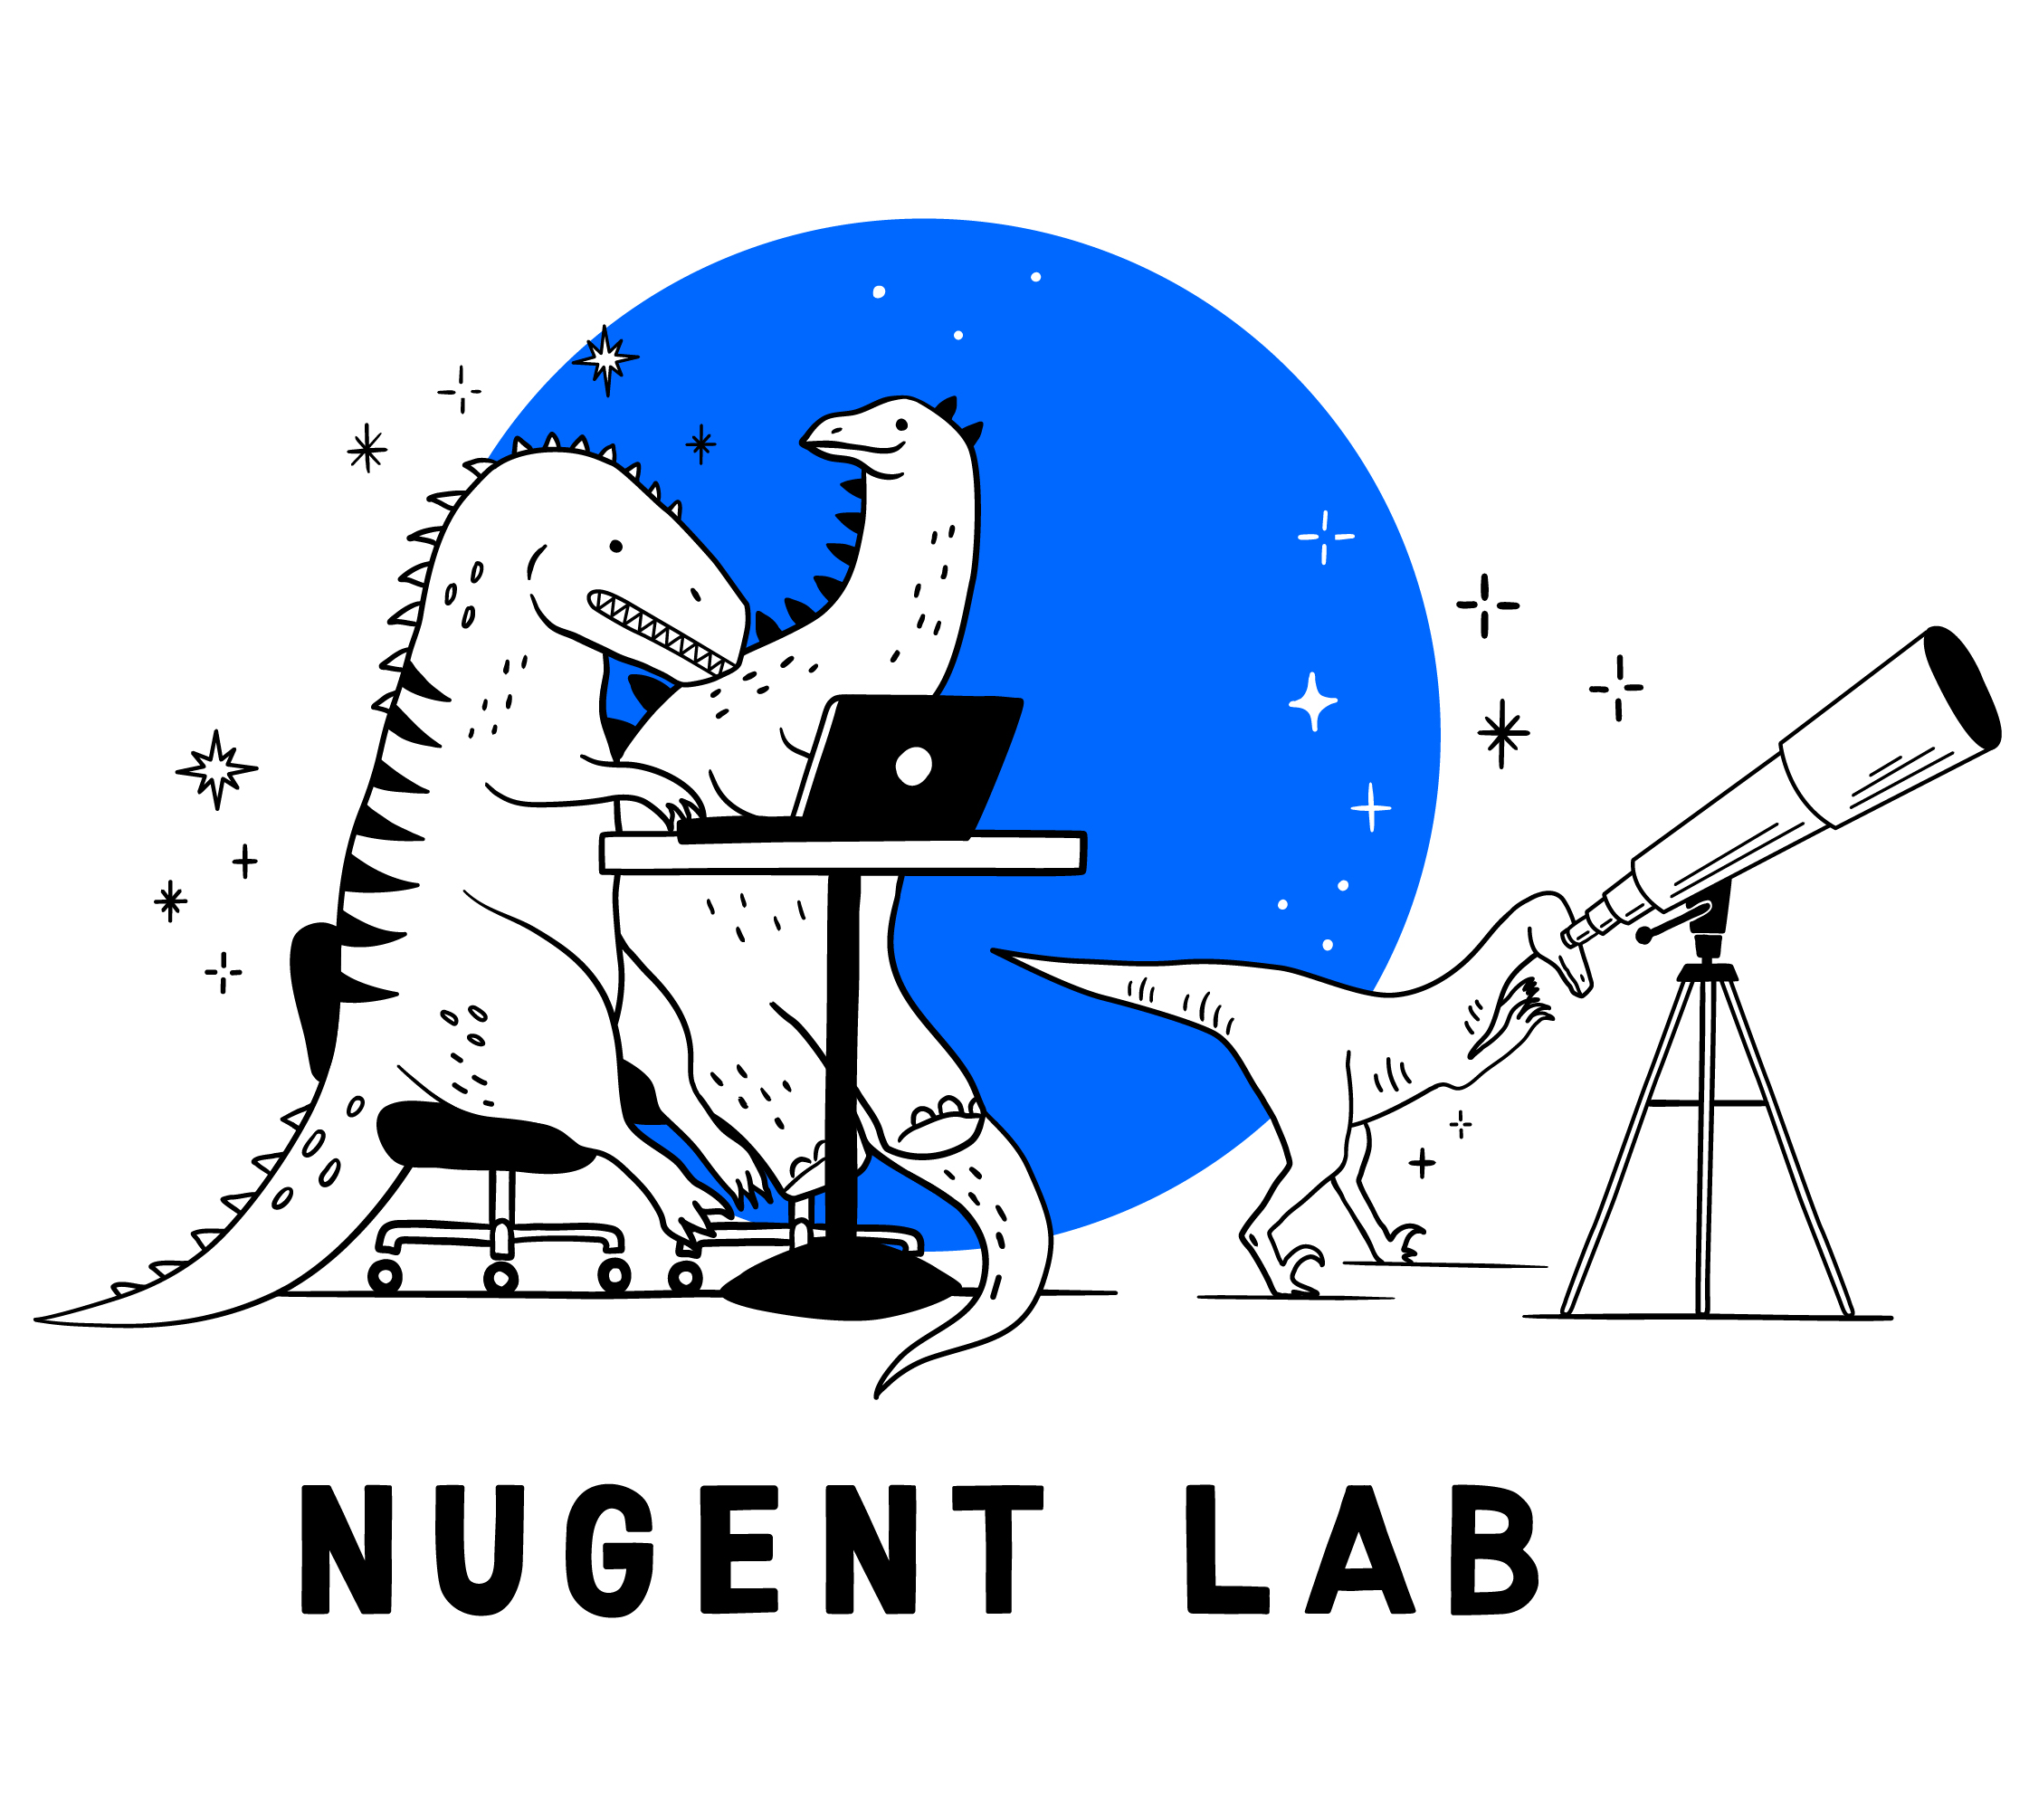 NugentLab-Blue-01.jpg